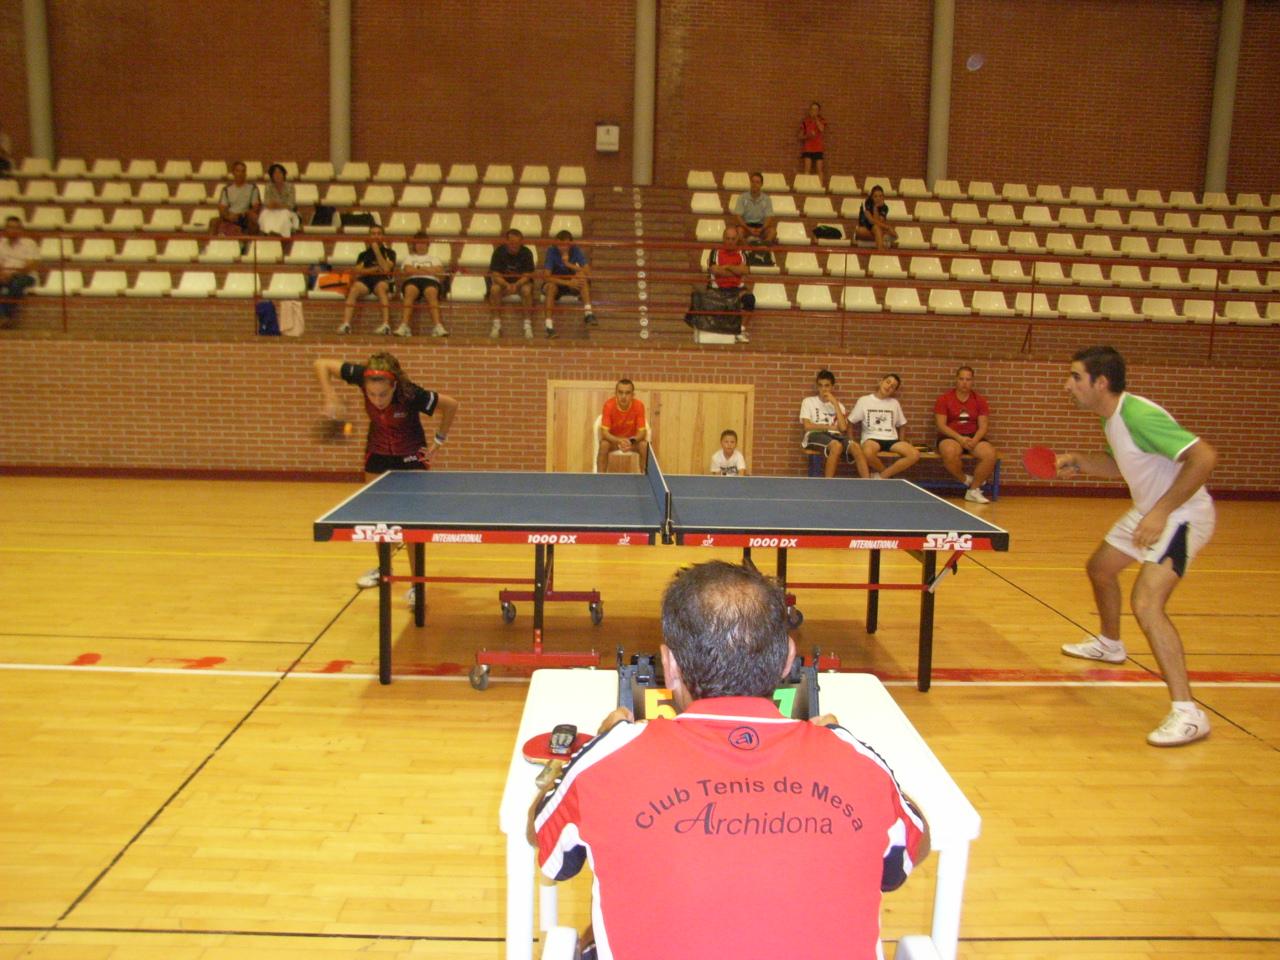 Patronato municipal deportivo de archidona torneo tenis de mesa - Torneo tenis de mesa ...